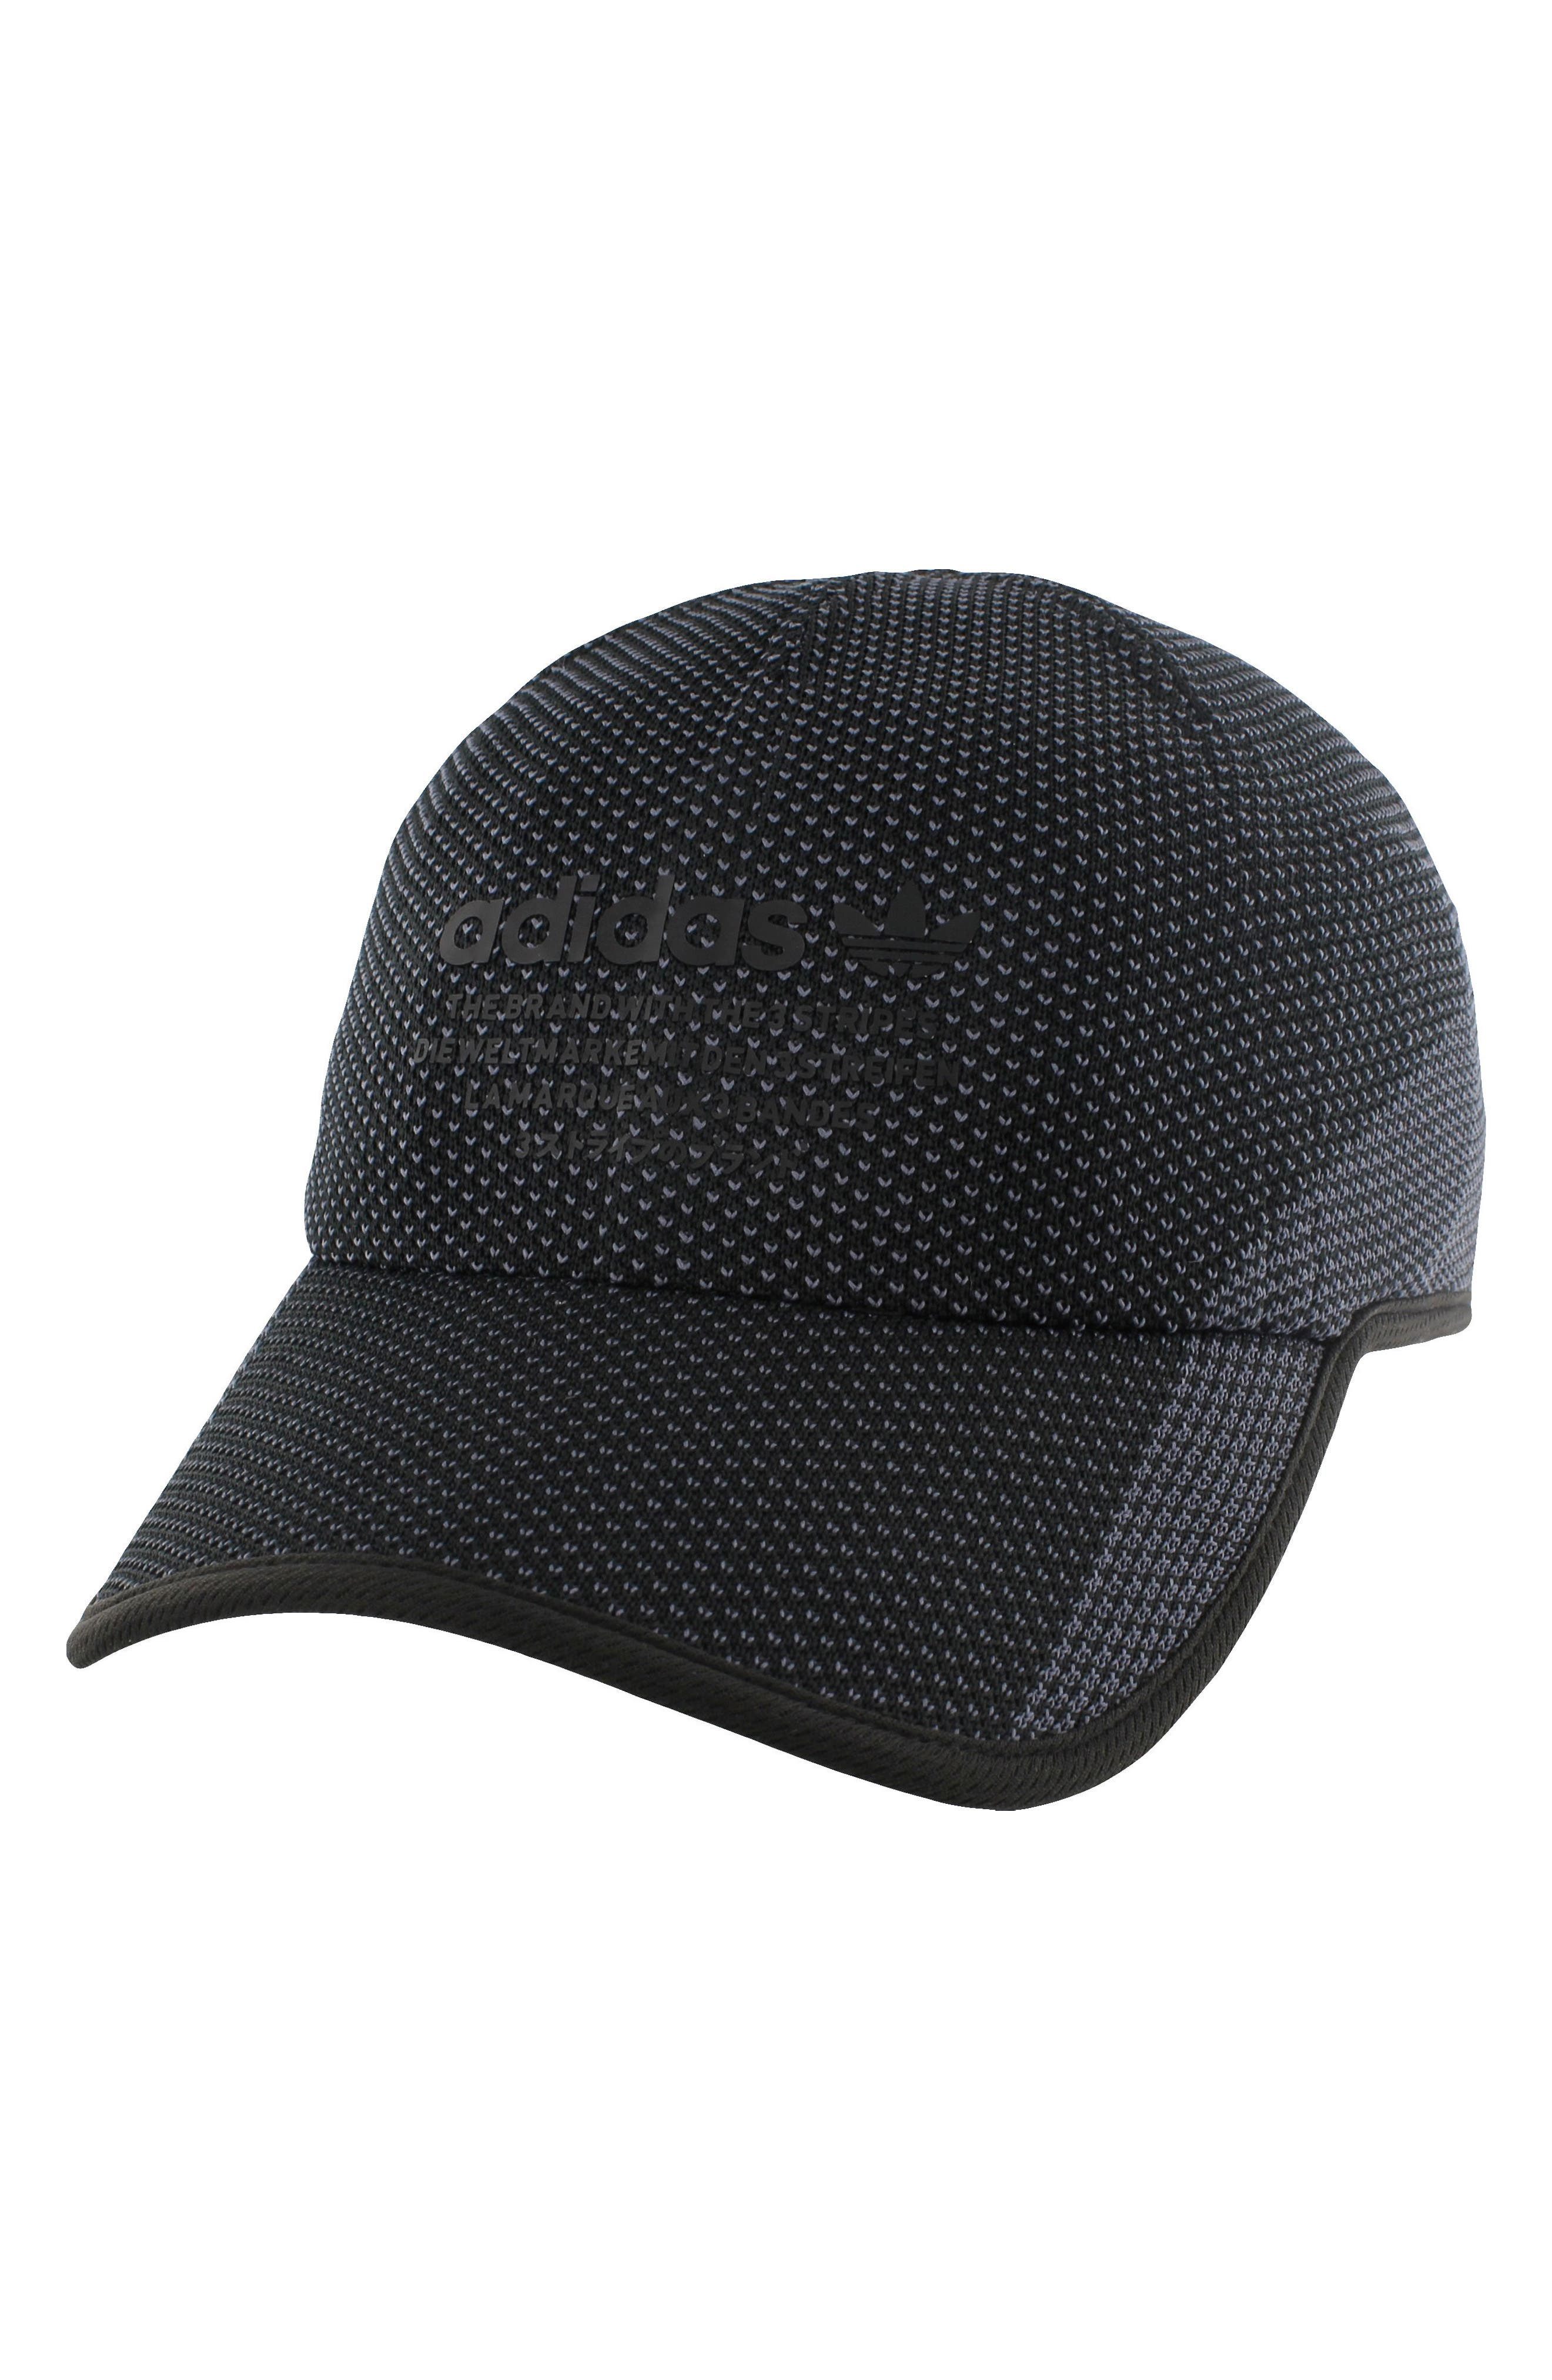 NMD Prime Ball Cap,                             Main thumbnail 1, color,                             Black